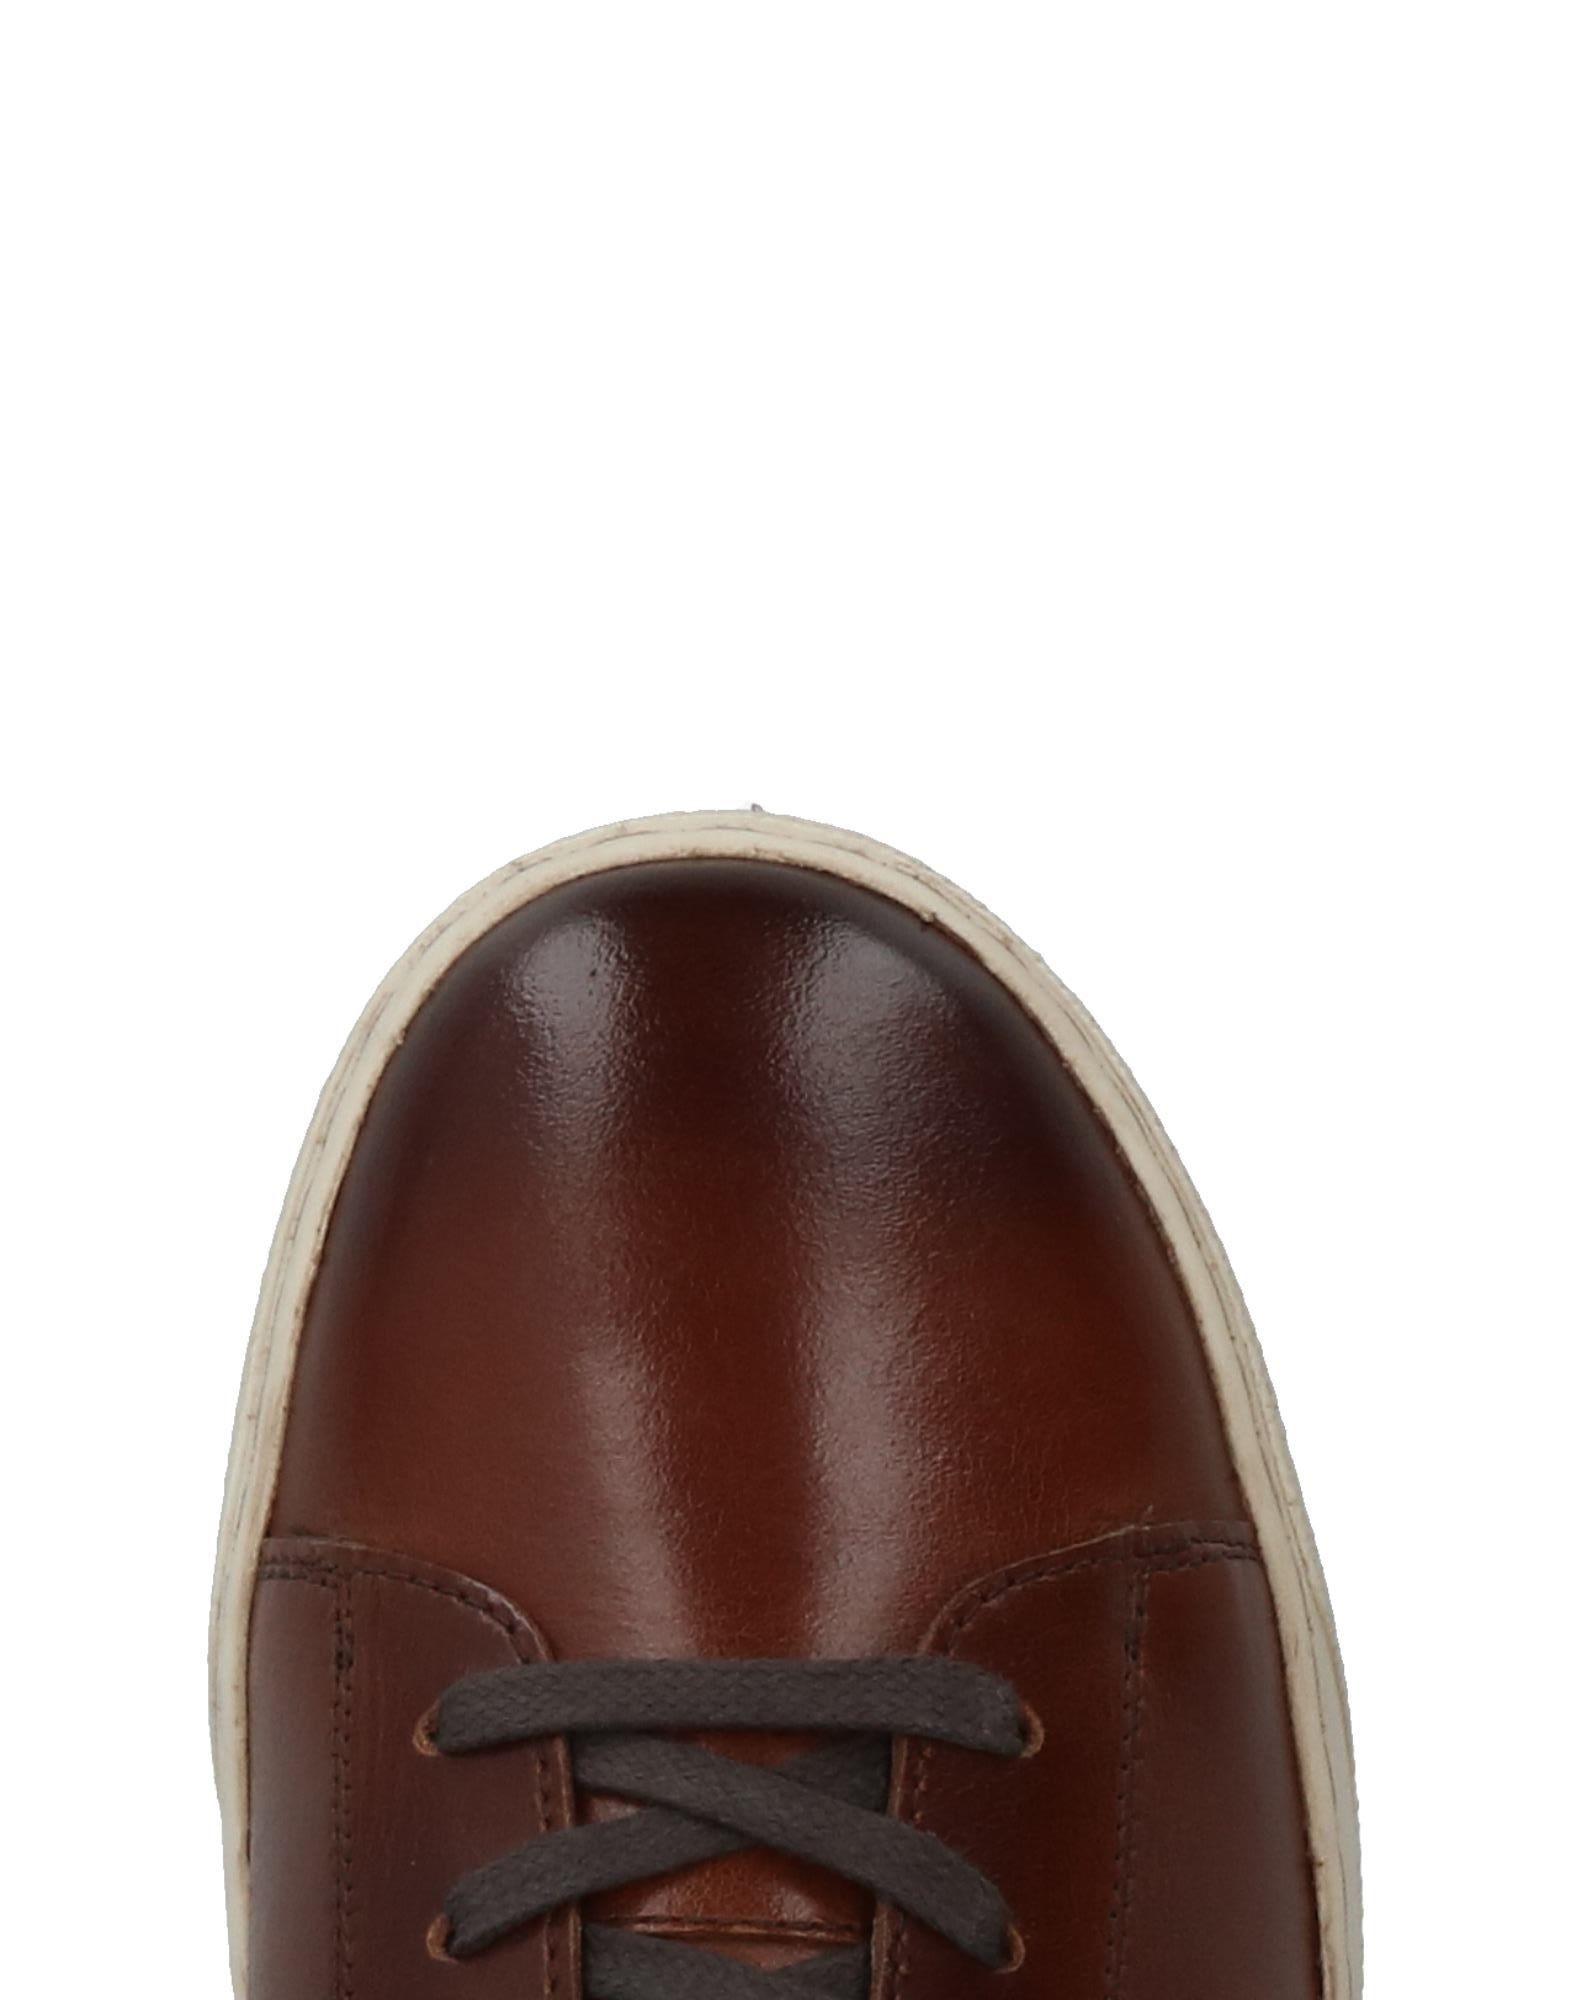 A buon mercato Sneakers Lumberjack Uomo - 11344804IB